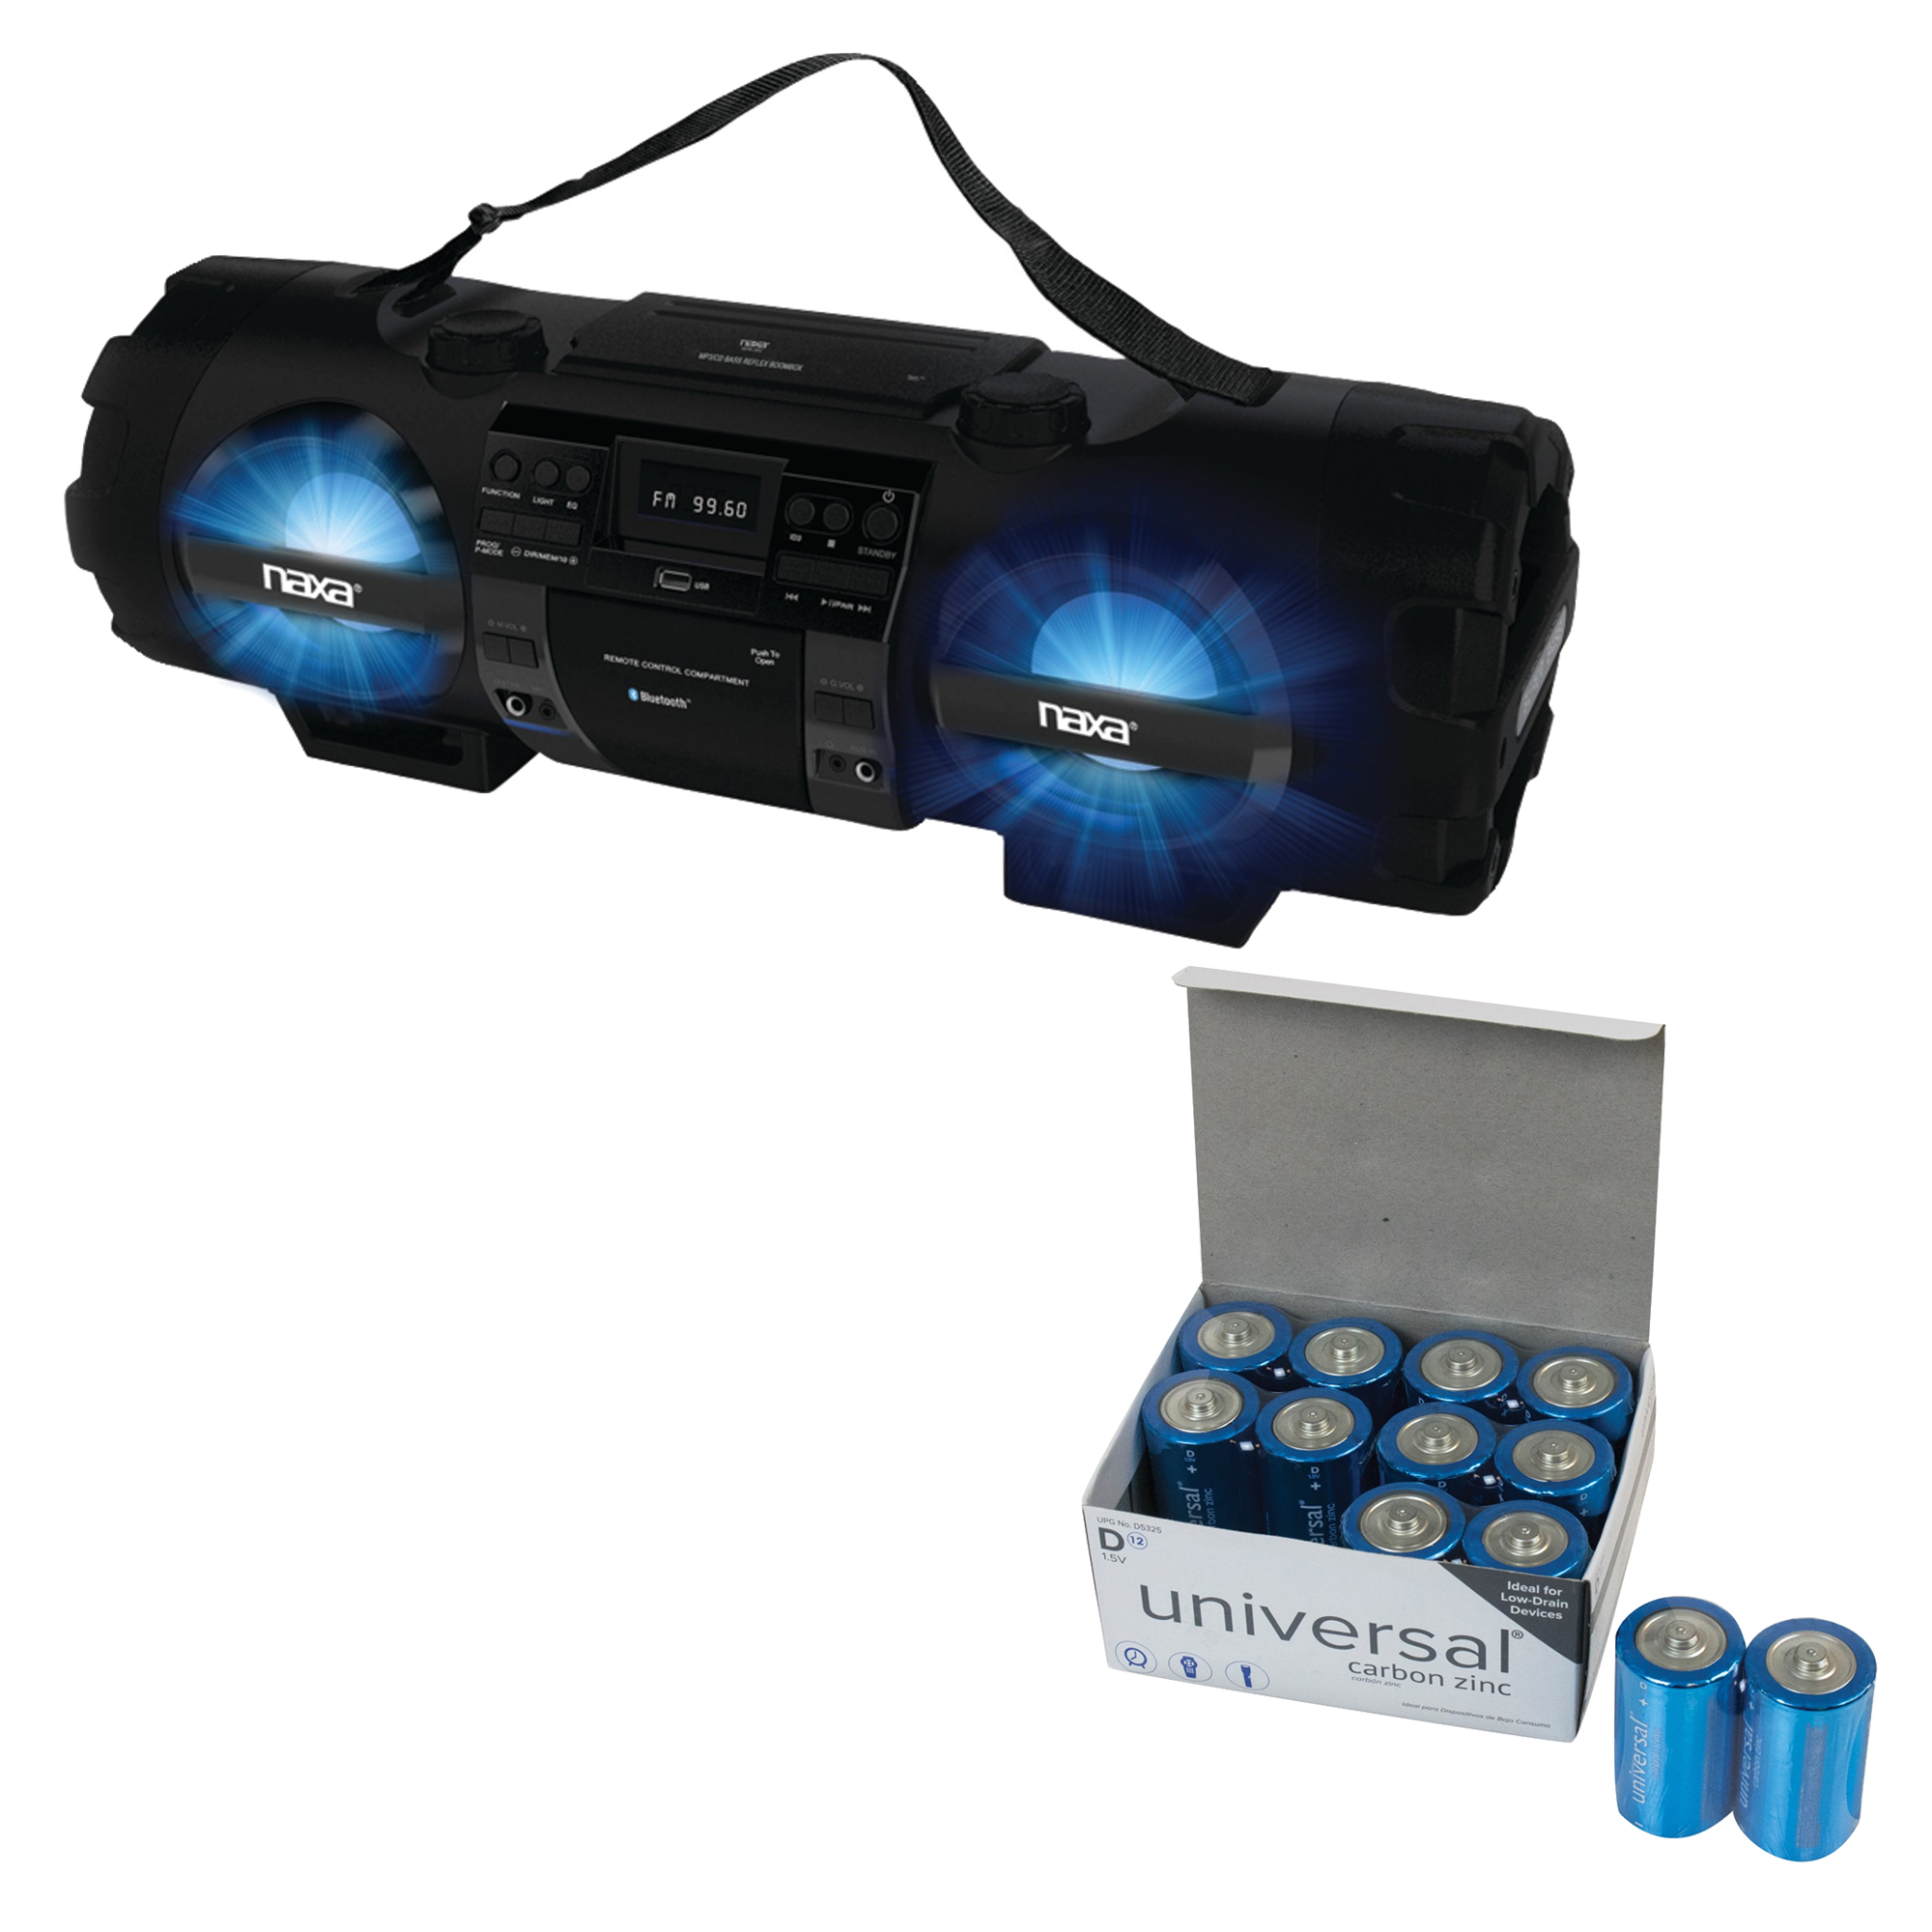 Naxa NPB-262 CD/MP3 Bass Reflex Boom Box & PA System With Bluetooth & UPG D 12 PACK